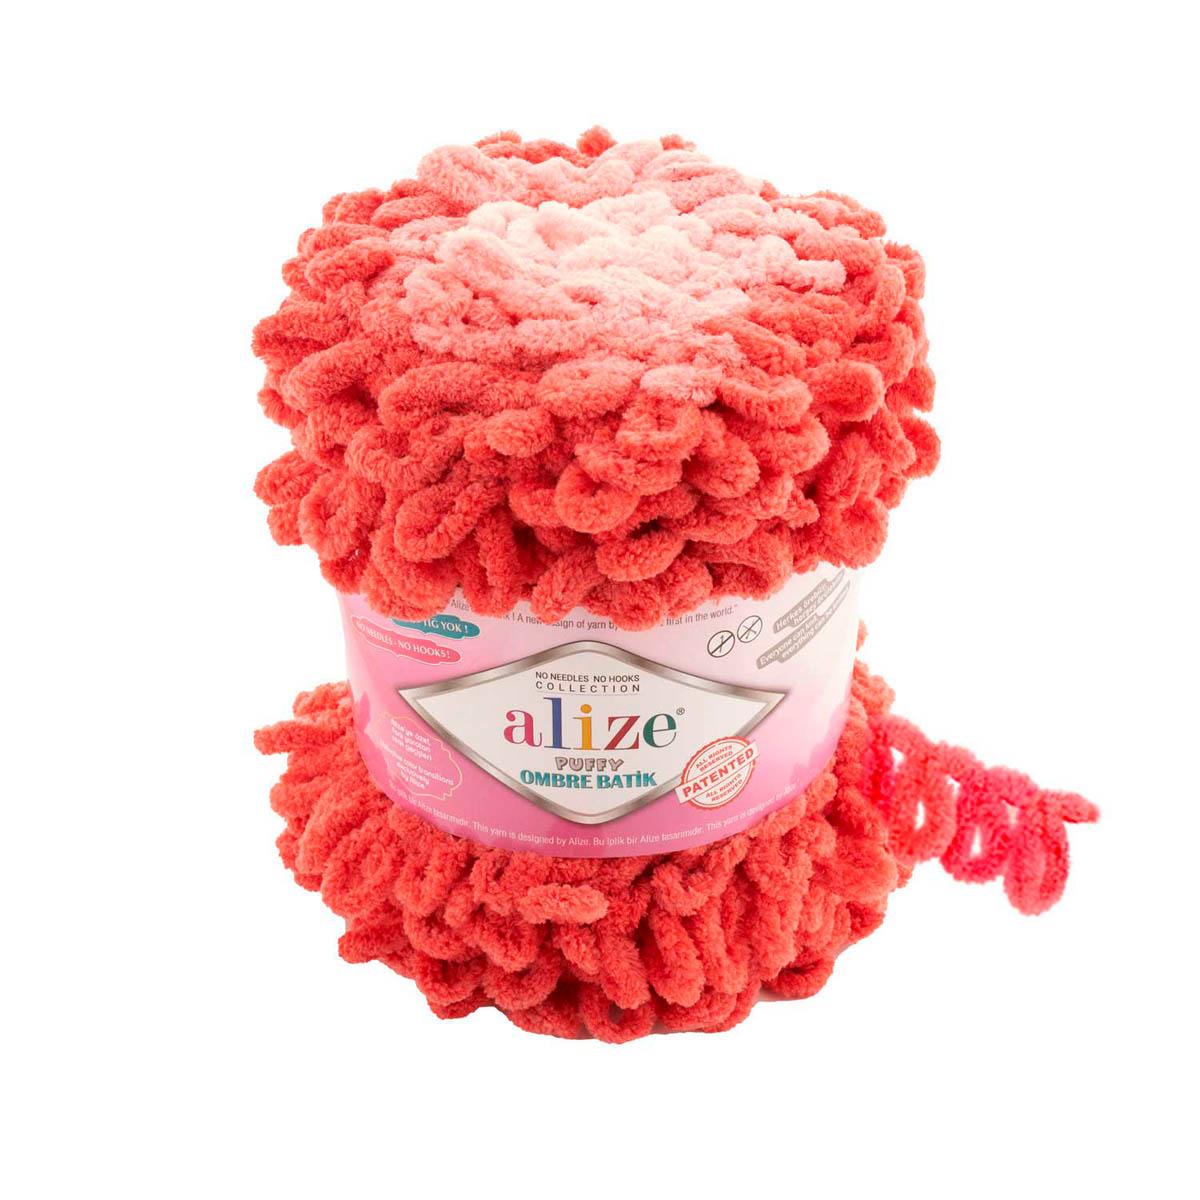 Пряжа Alize 'Puffy Ombre Batik' 600г 55м (100% микрополиэстер)